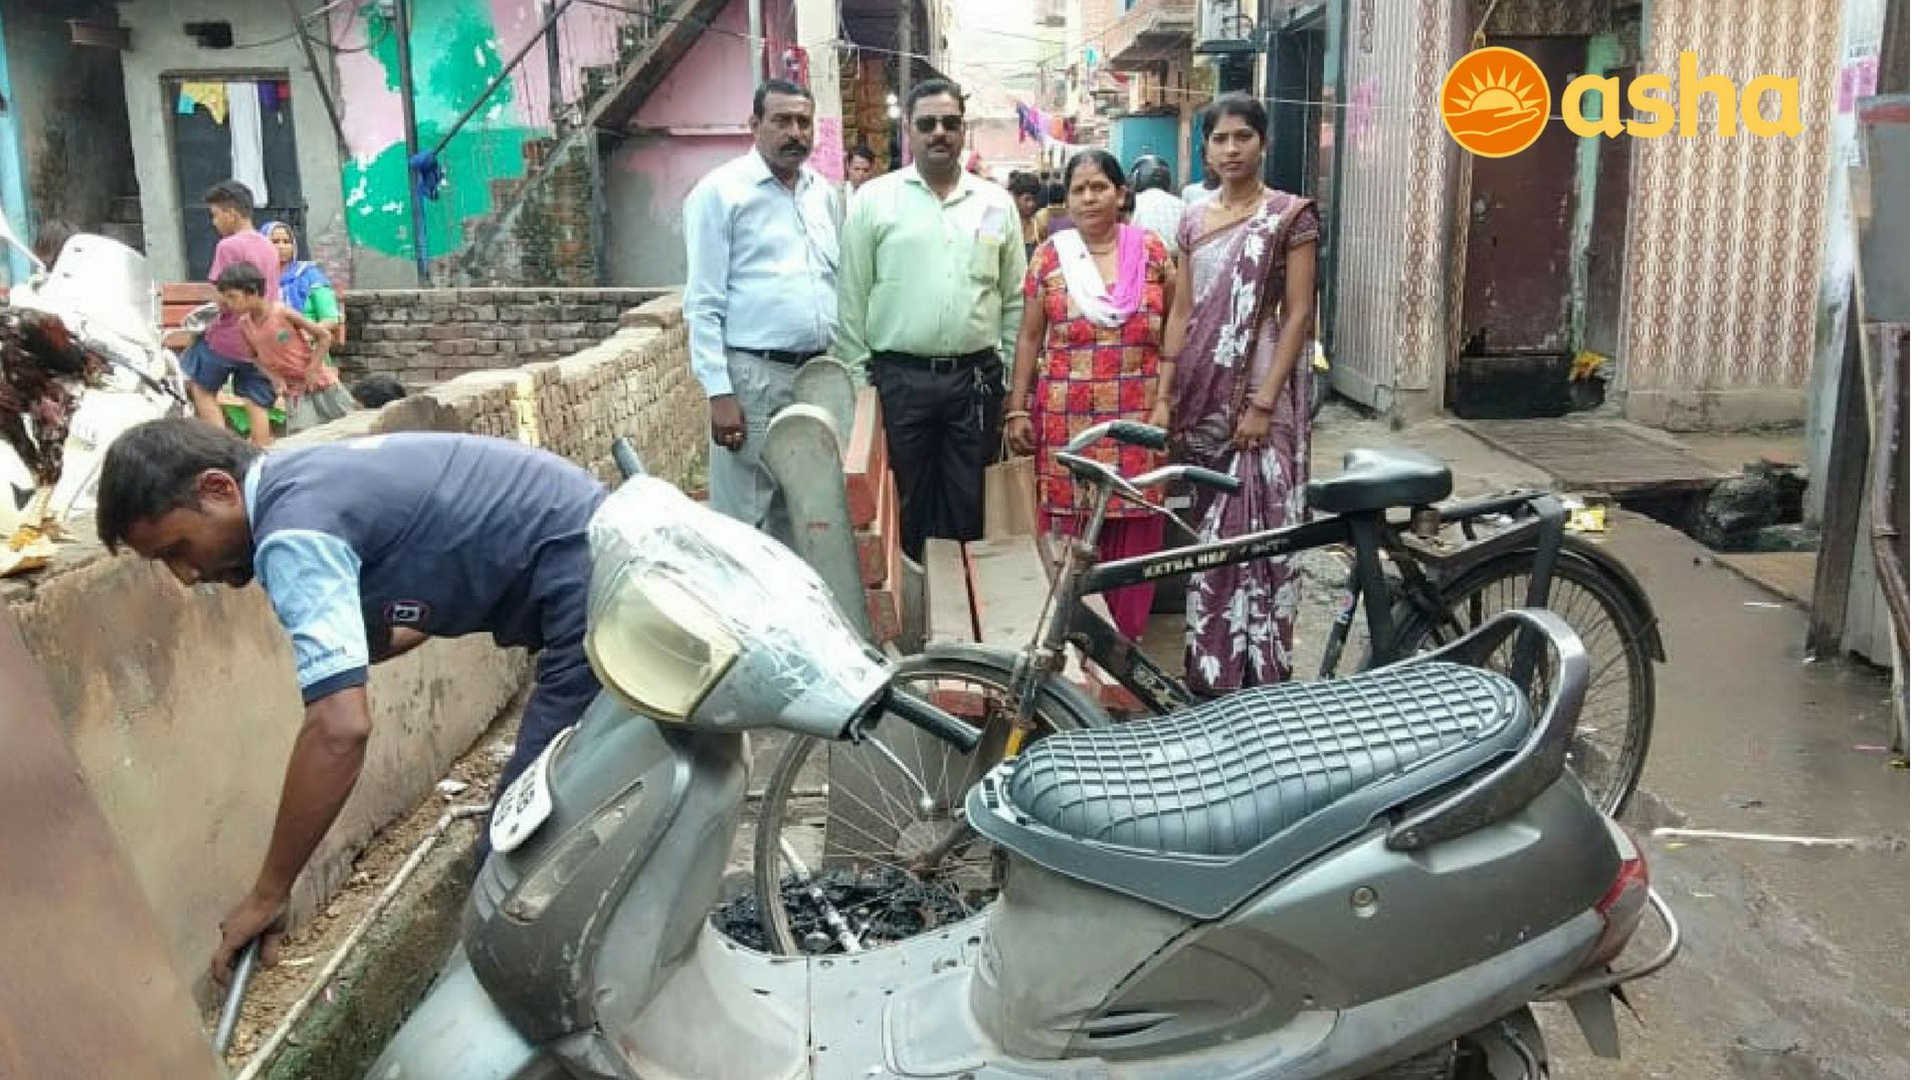 Authorities examining the slum